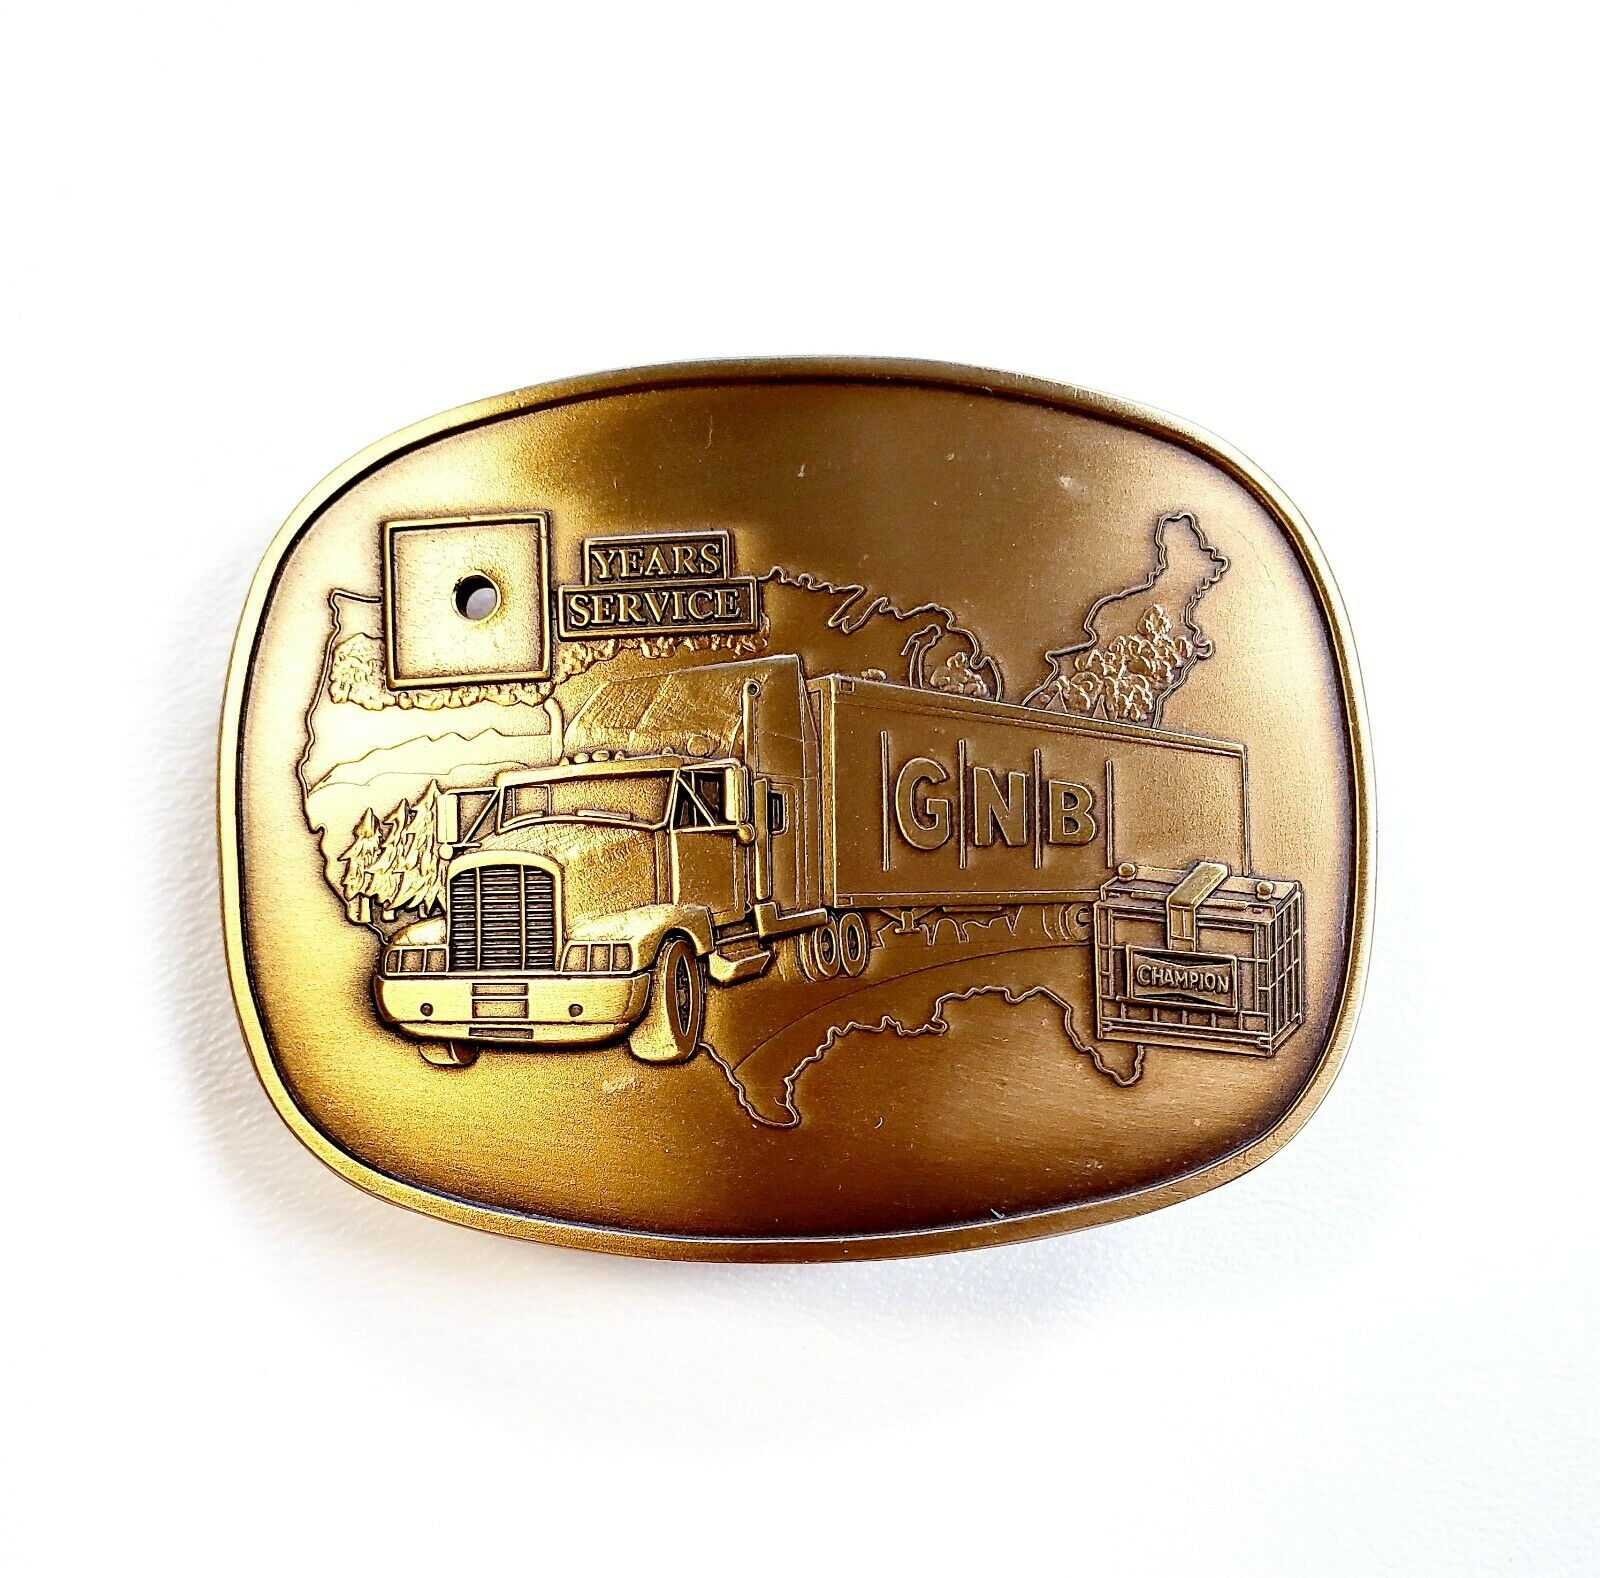 GNB Bank Employee Years Service Belt Buckle USA Made Solid Brass 3